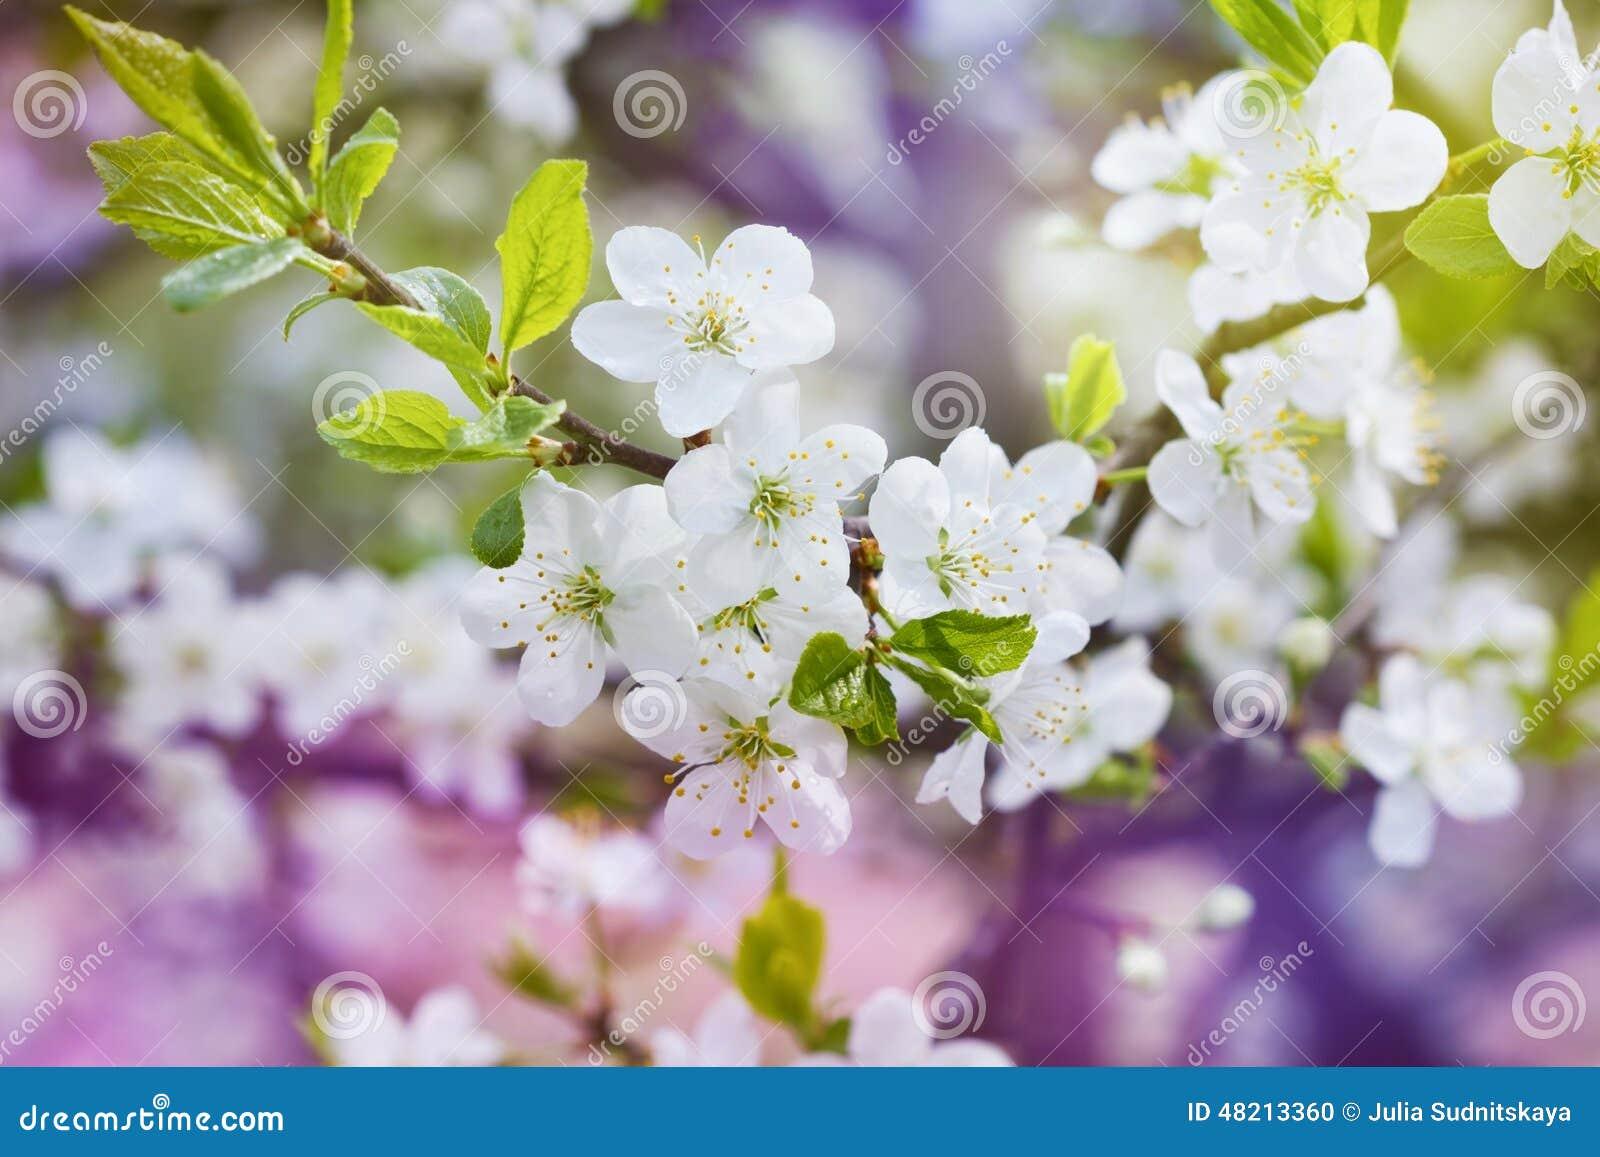 Blossom cherry branch beautiful spring flowers for vintage download blossom cherry branch beautiful spring flowers for vintage background stock photo image of izmirmasajfo